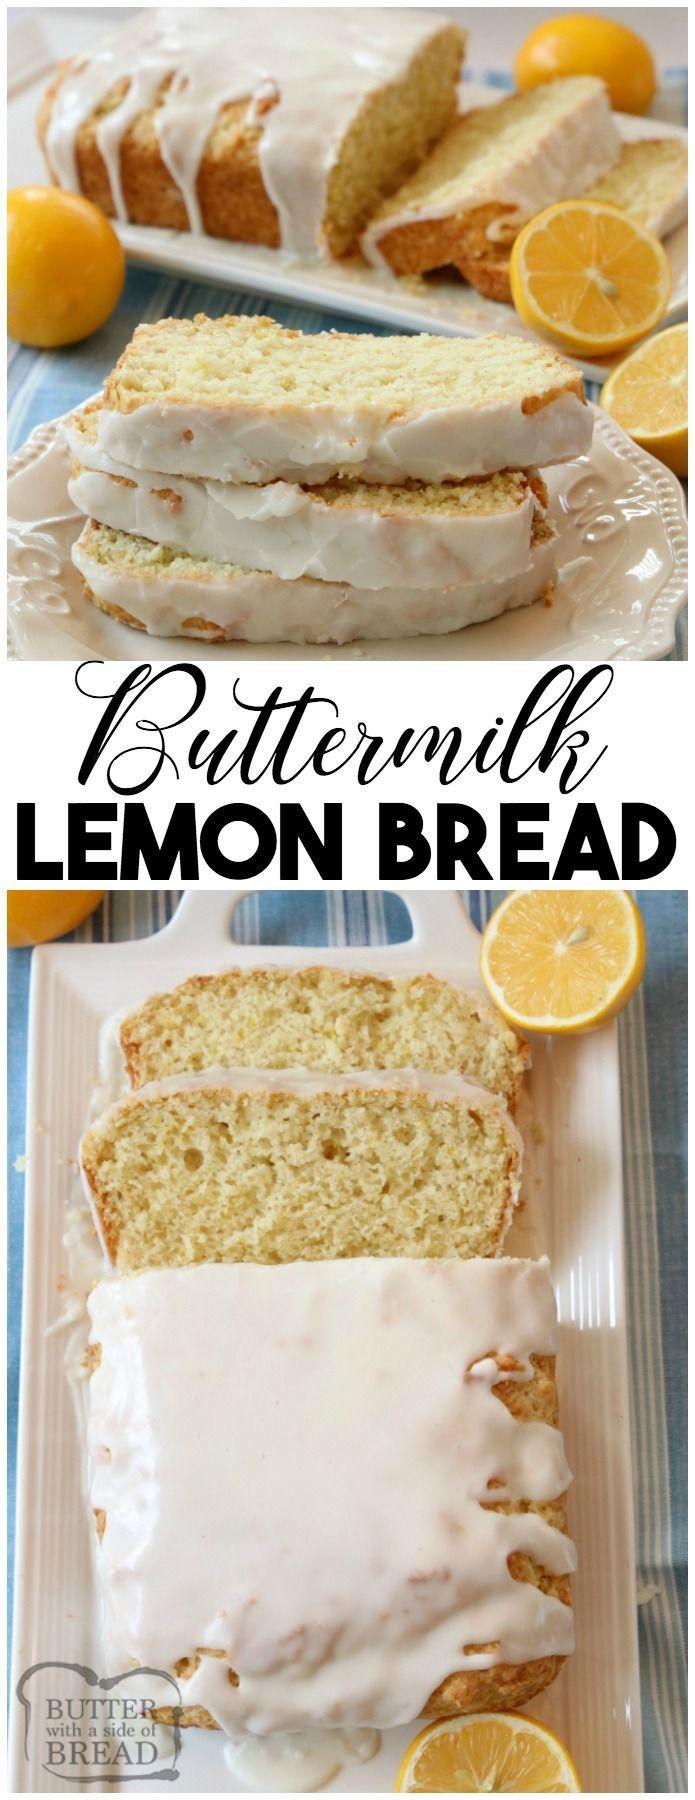 Lemon Butter Cookies Recipe Buttermilk Recipes Lemon Recipes Lemon Bread